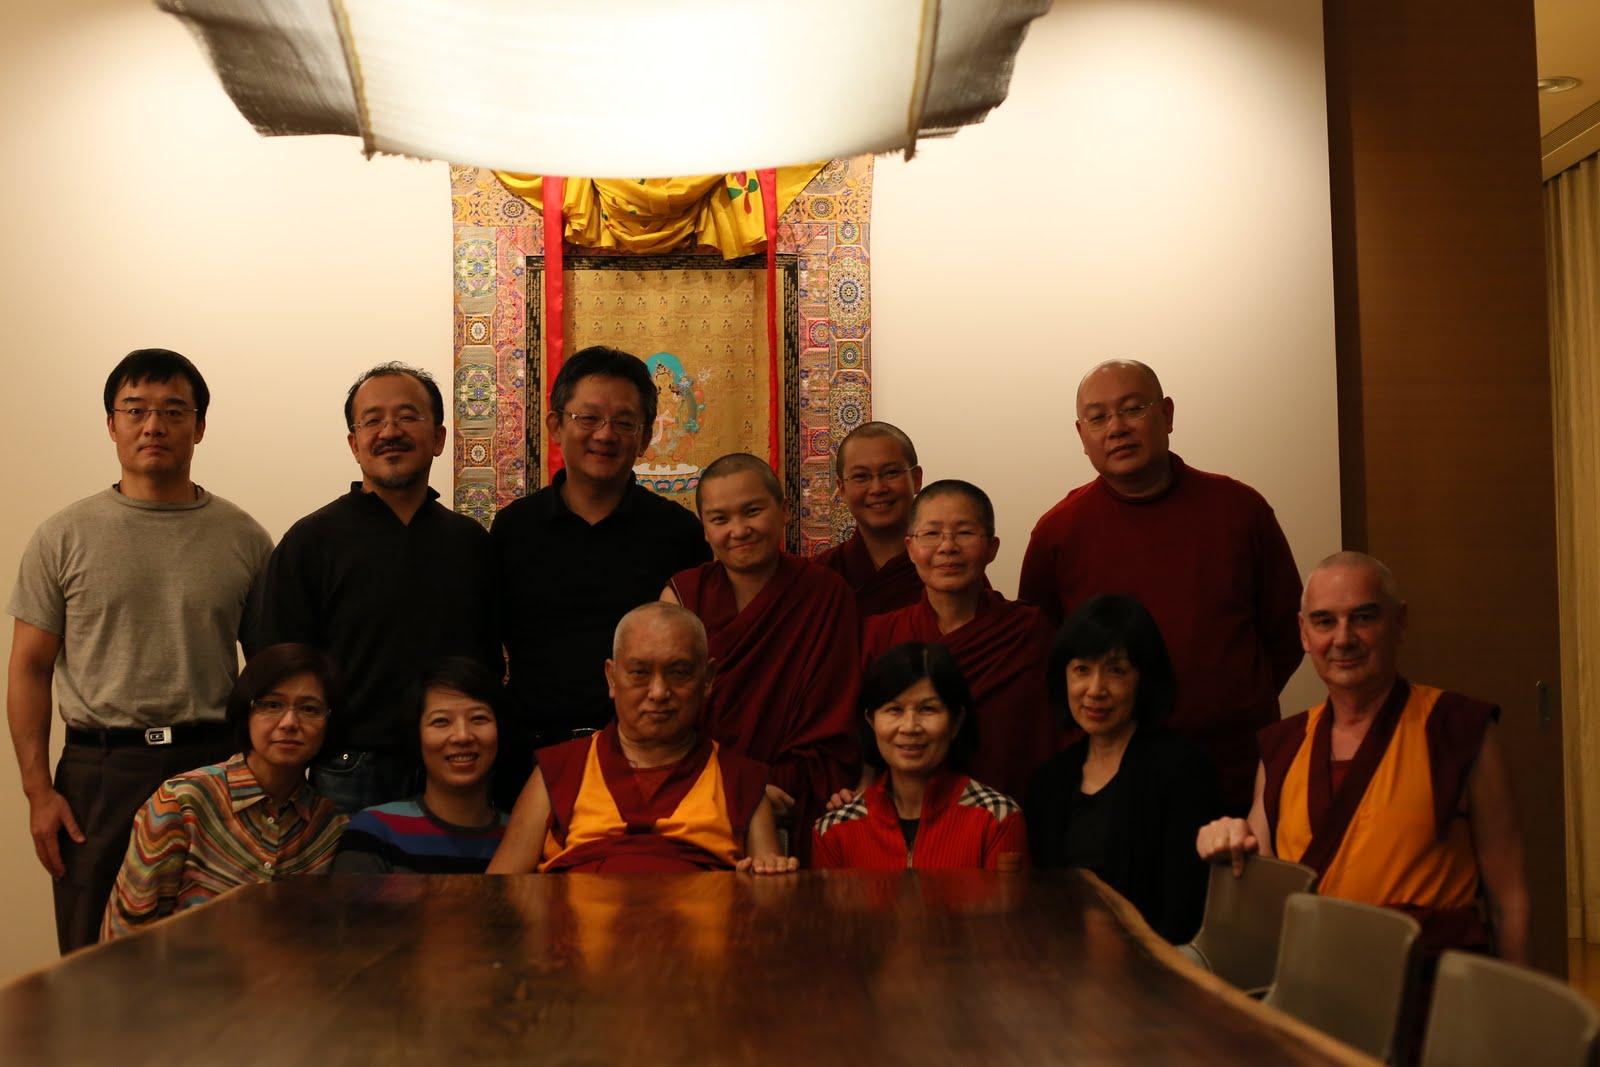 Lama Zopa Rinpoche at Jinsiu Farlin, Lama Chopa Puja.